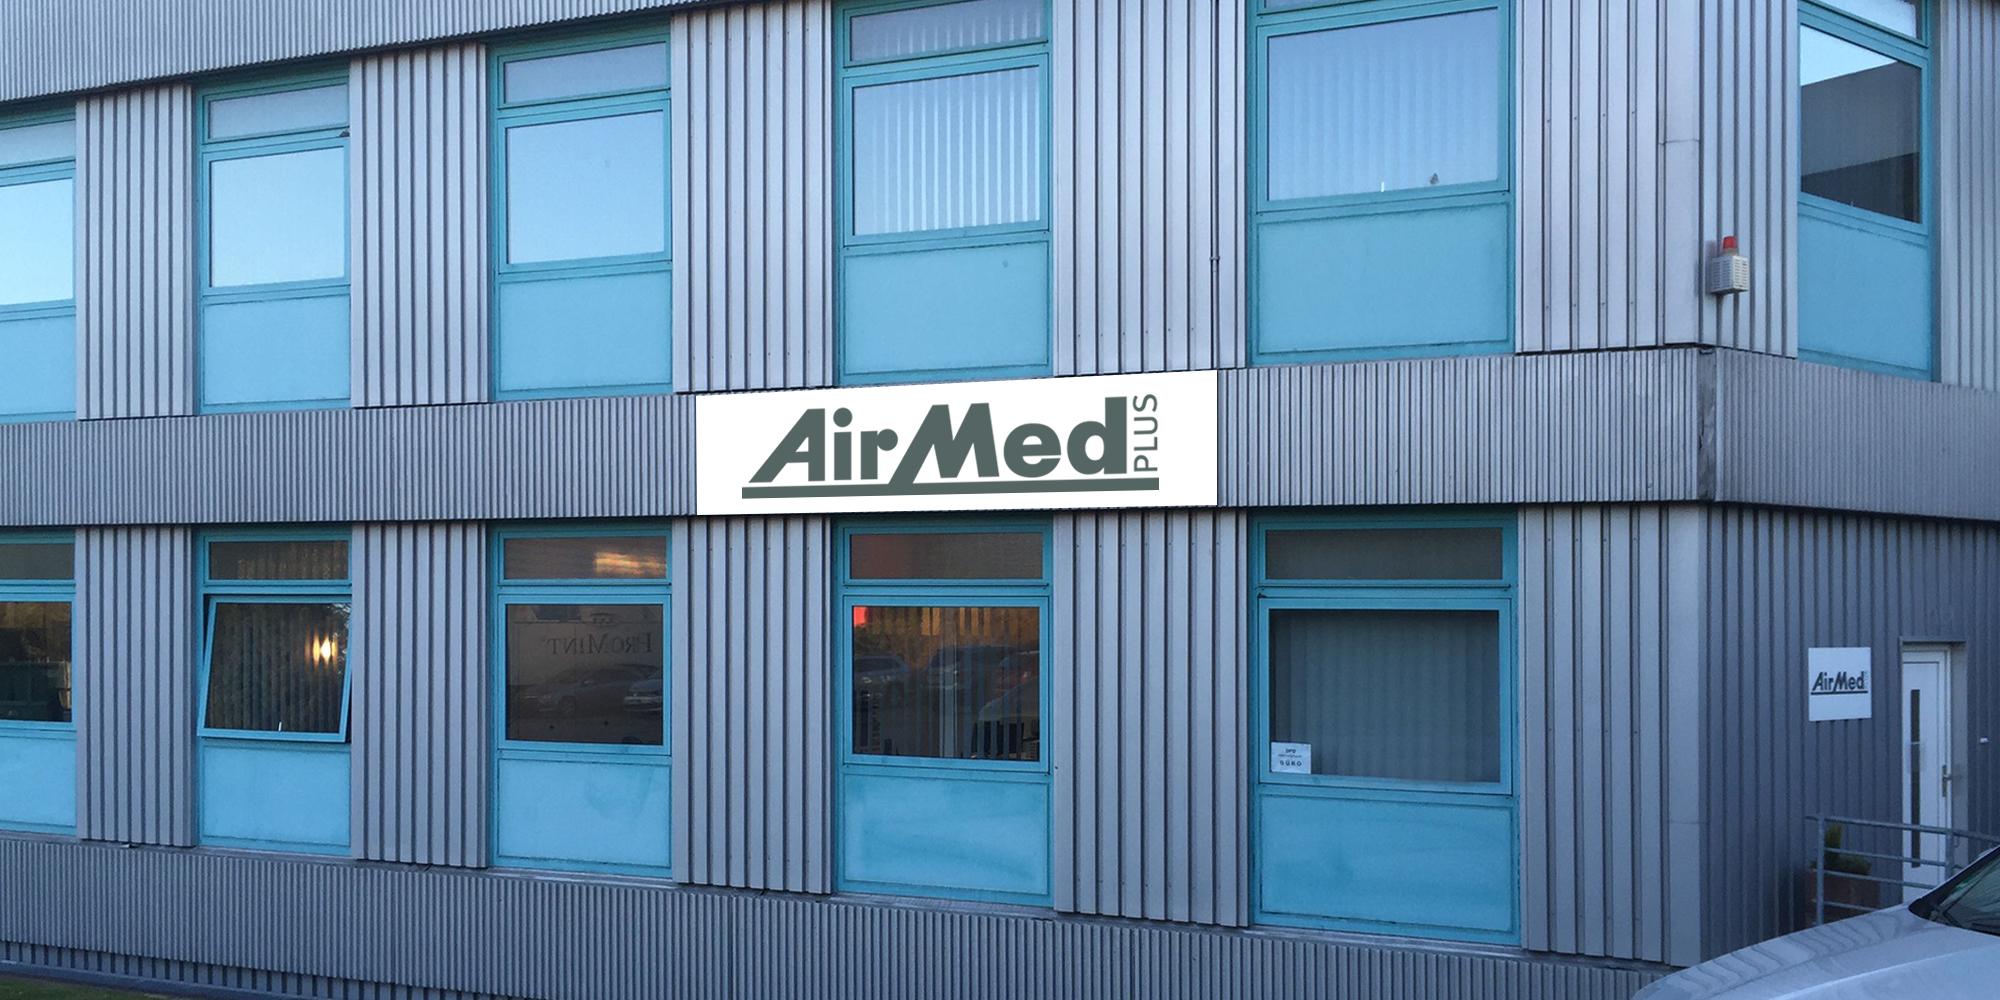 AirMedPLUS GmbH in Bochum